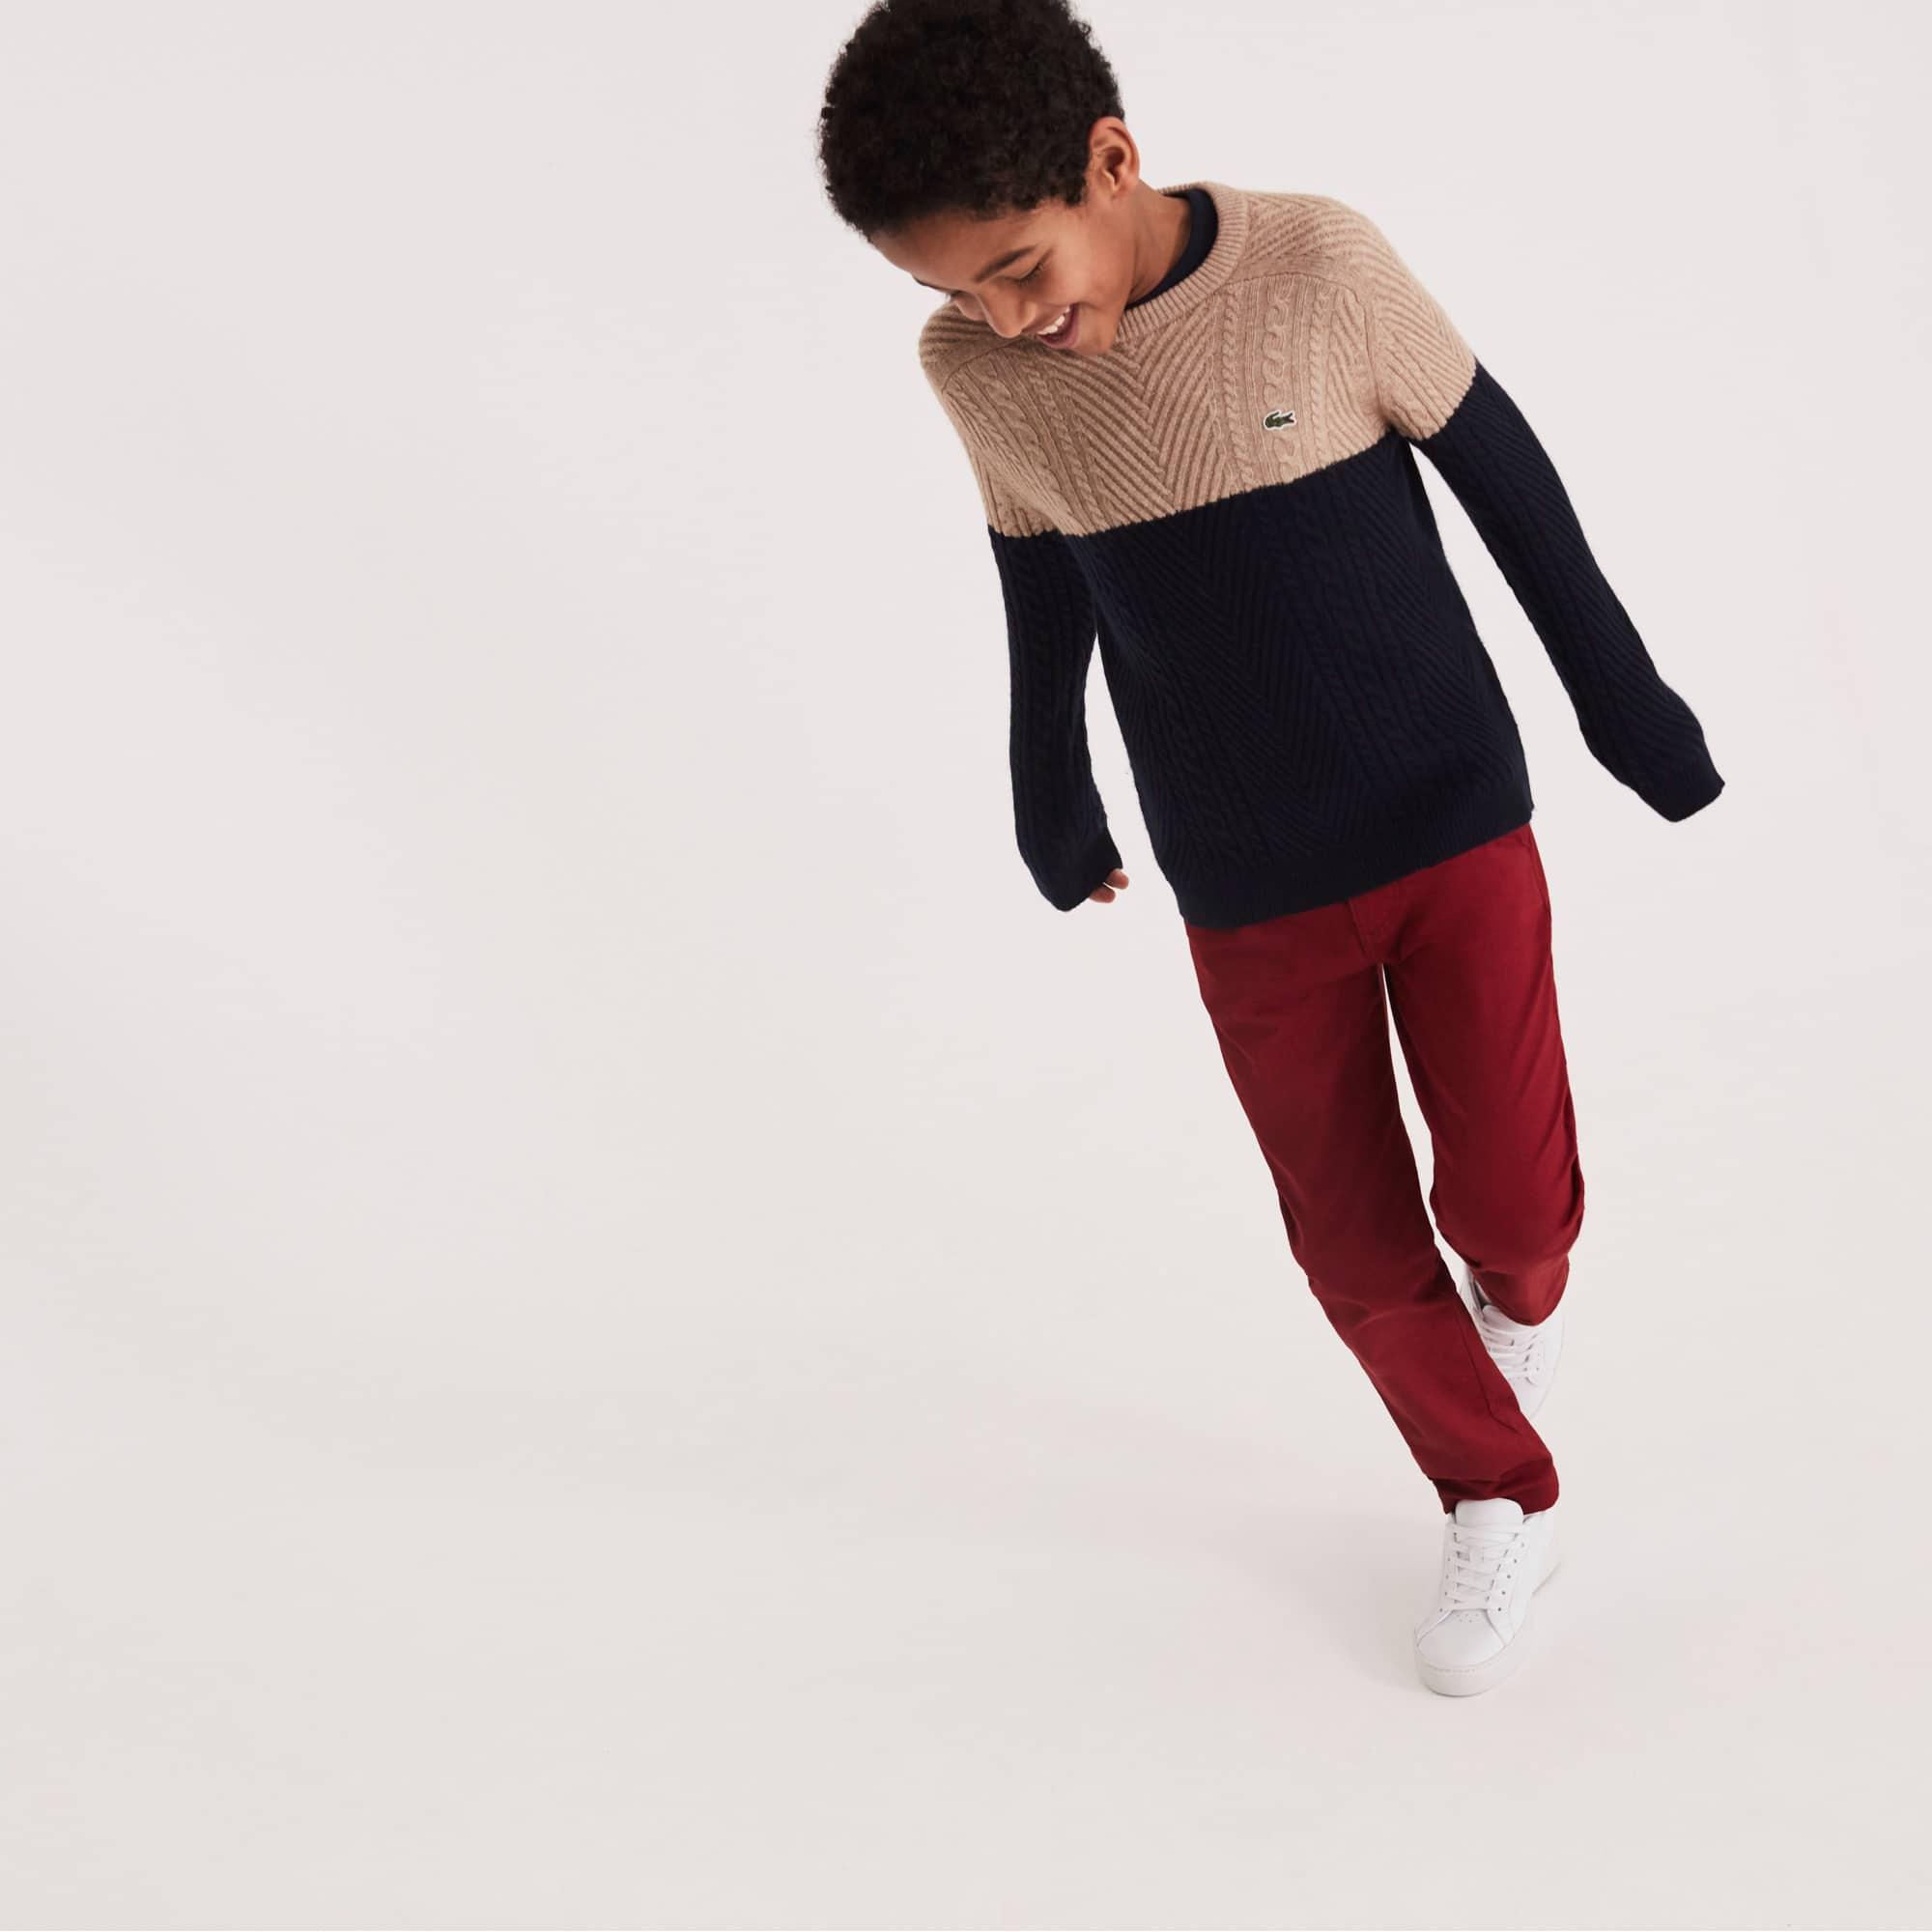 Chino-Hose aus farbiger Baumwollgabardine